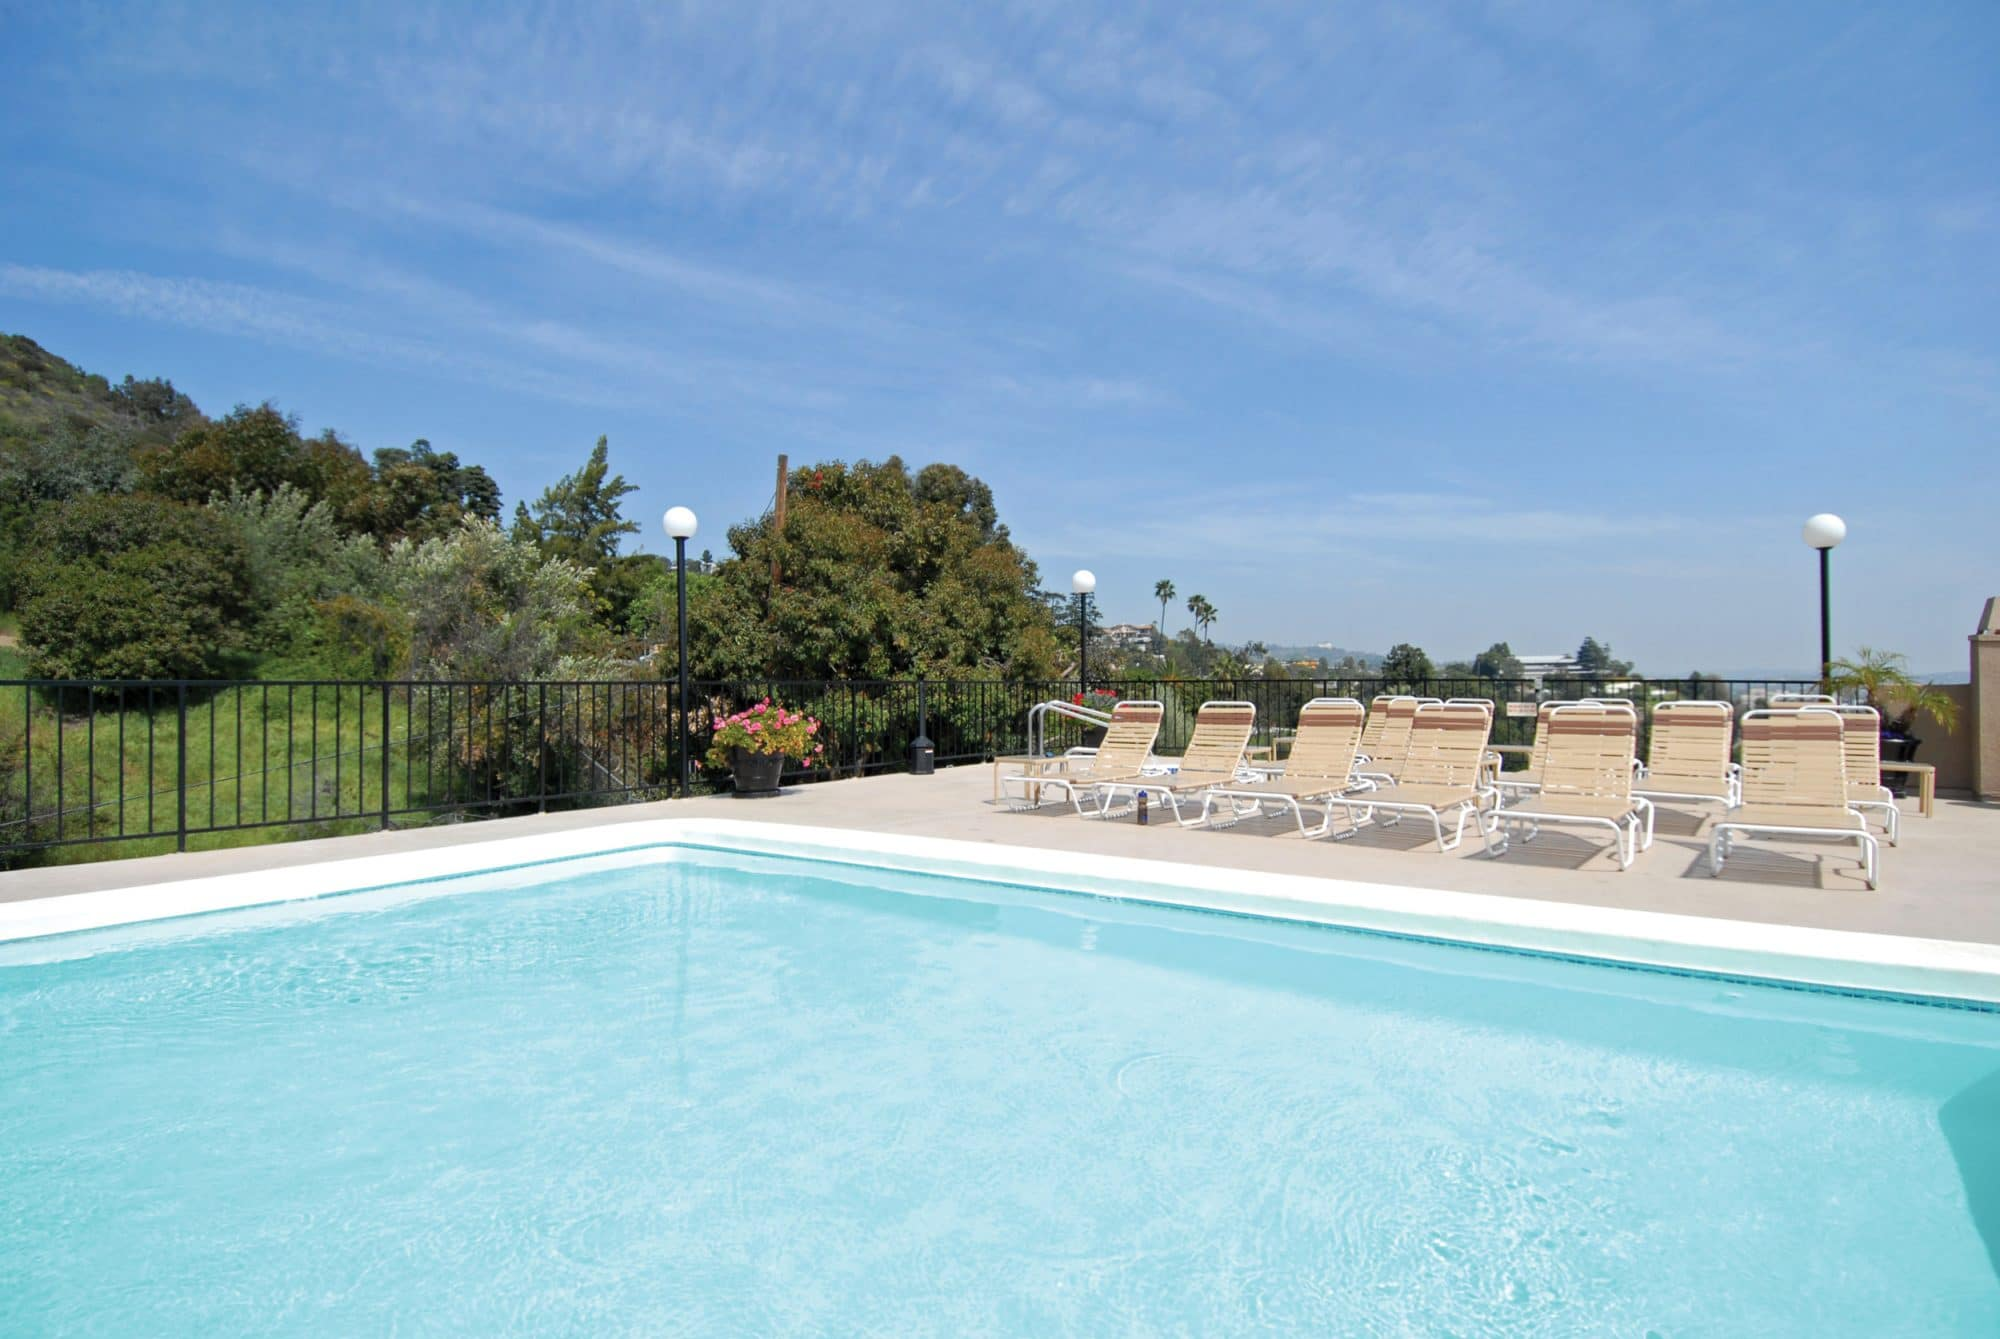 Pinnacle Apartments Hollywood California pool